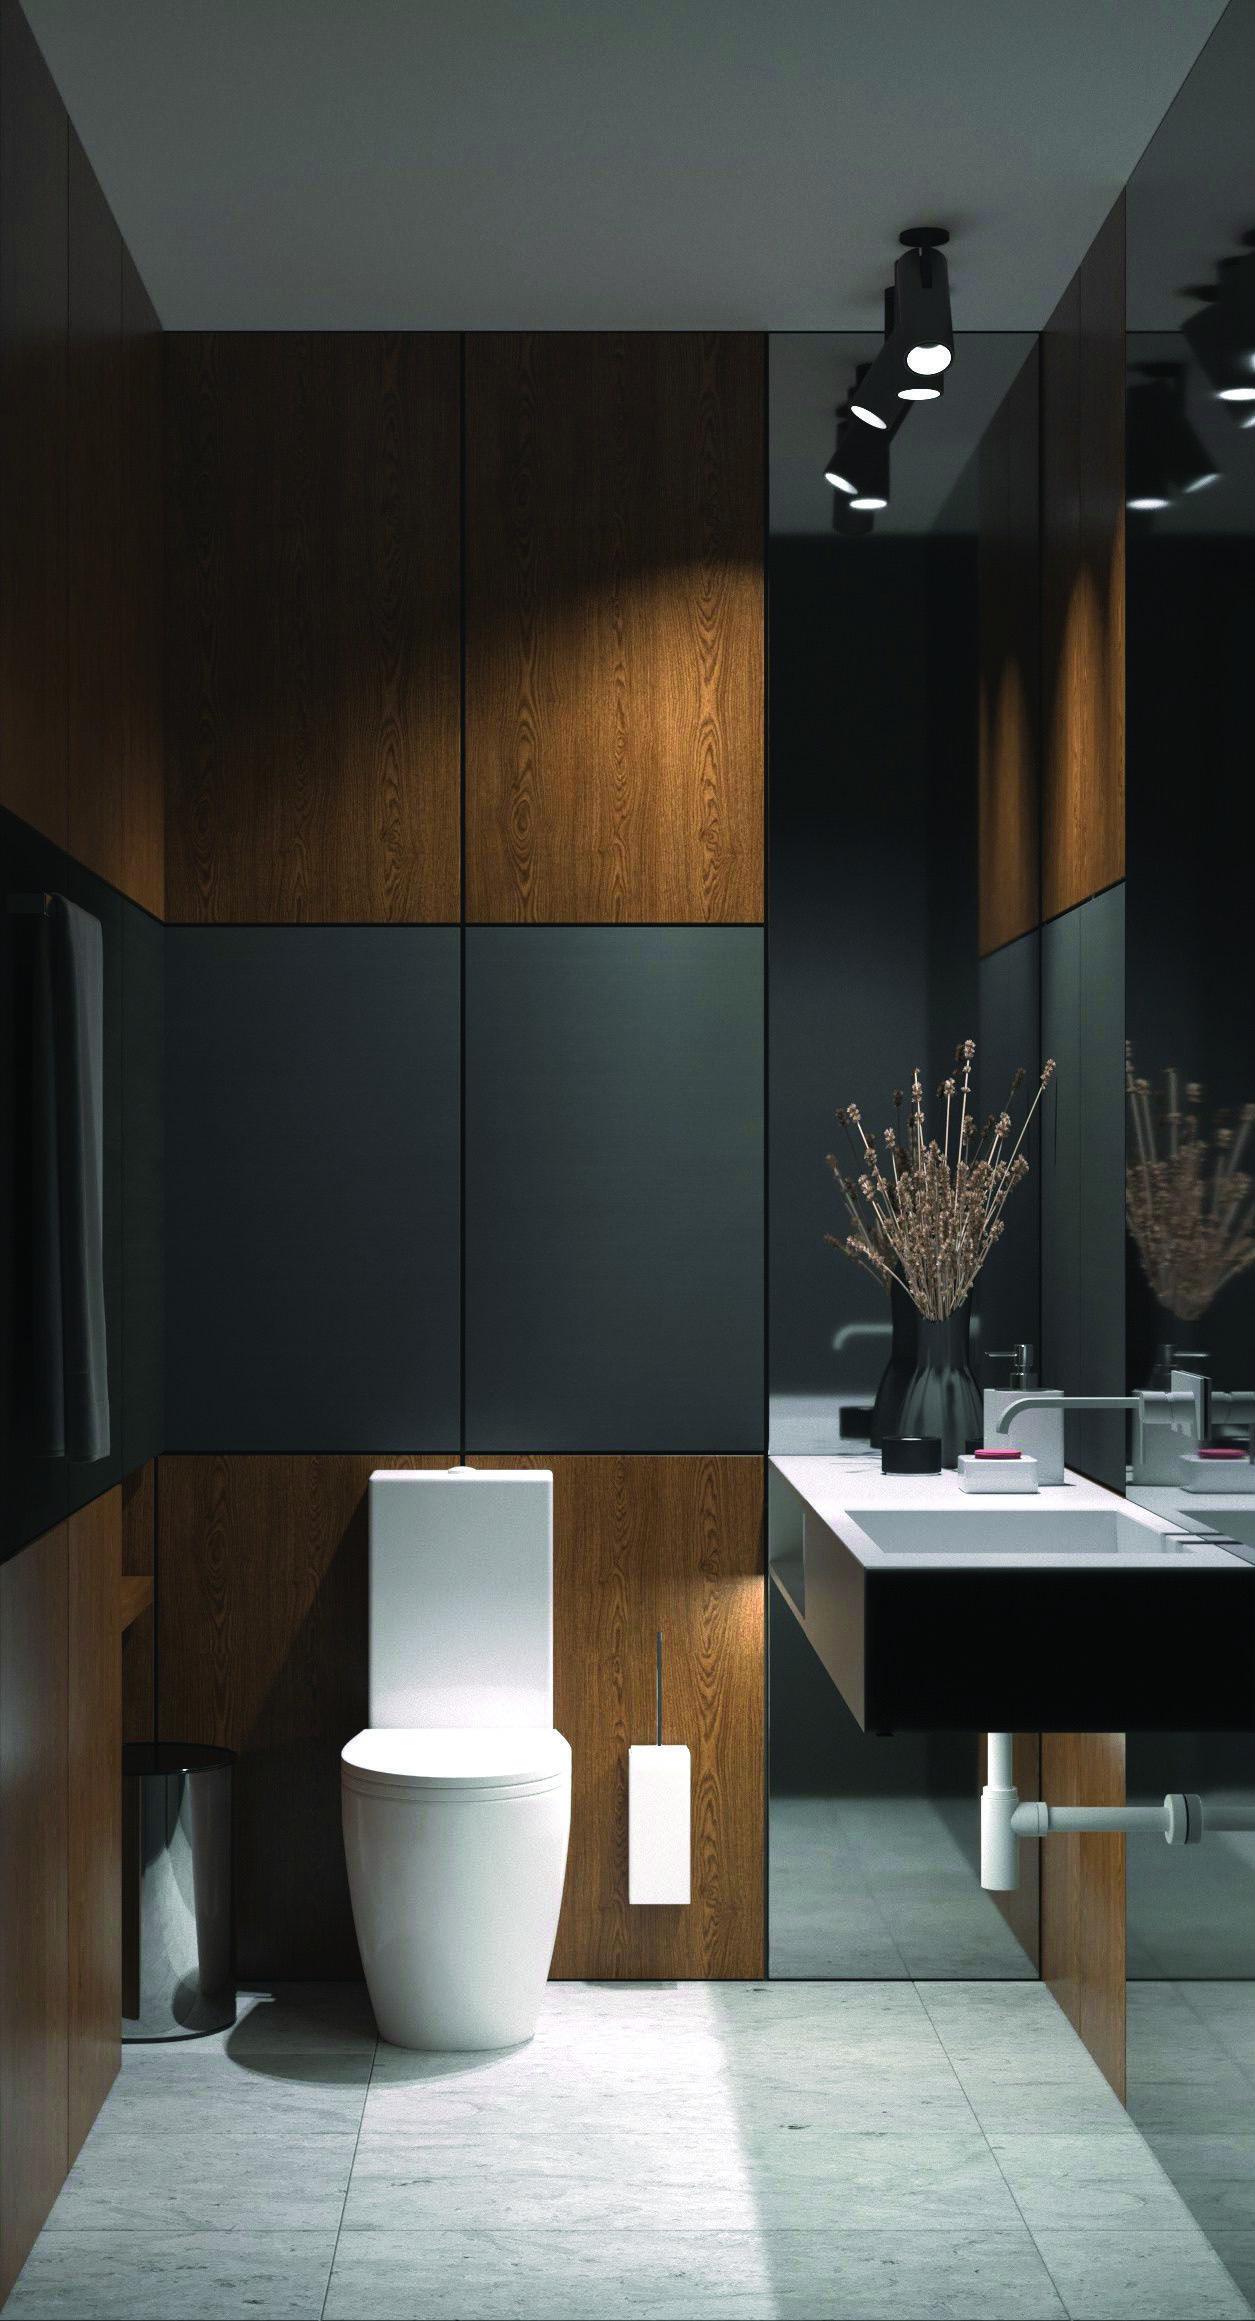 Restroom Ceramic Tile Design Suggestions Homes Tre Toilet Design Modern Powder Rooms Bathroom Interior Design